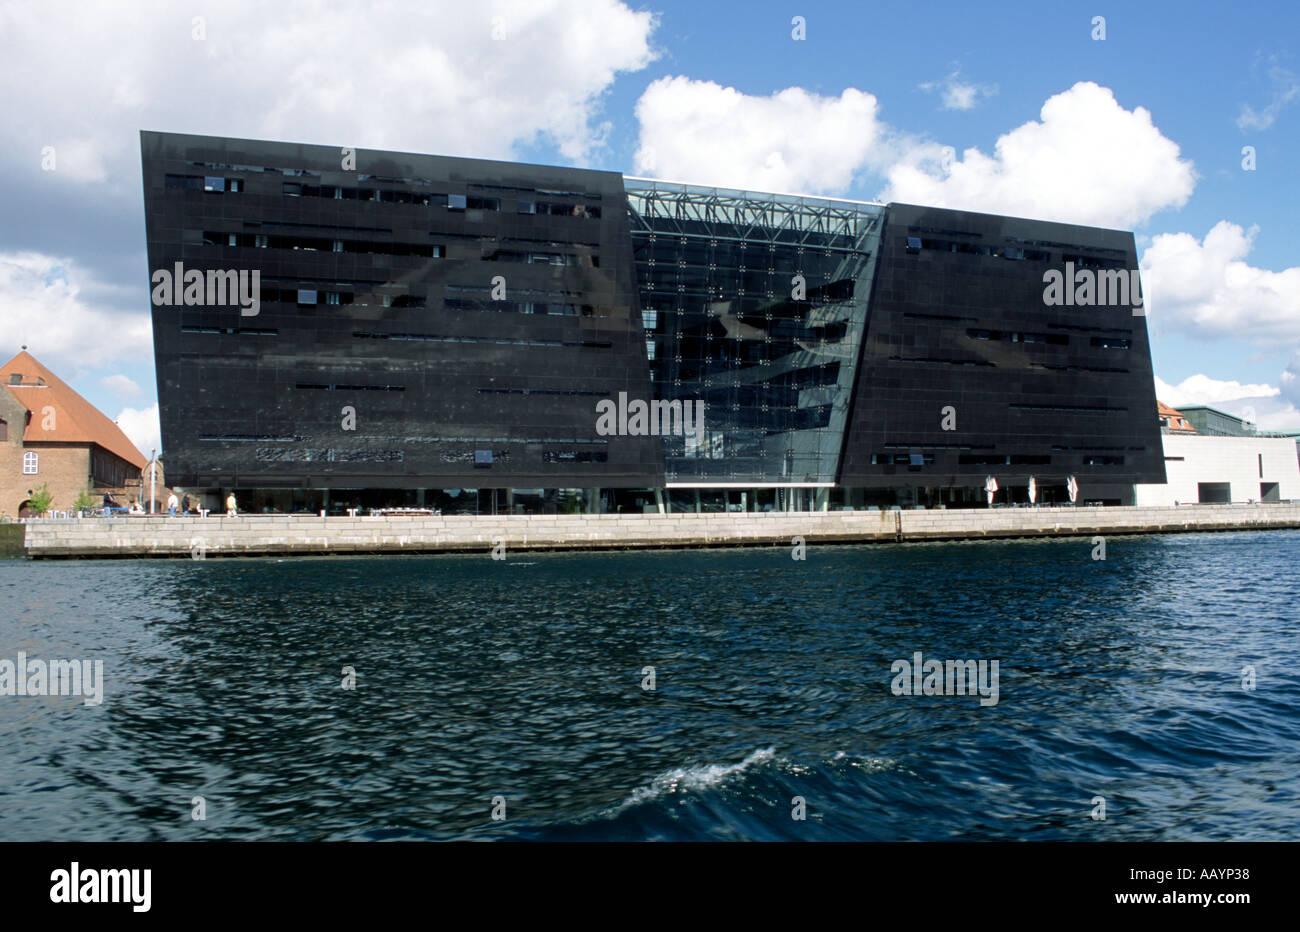 The Royal Danish Library  also called The Black Diamond Christians Brygge in Copenhagen Denmark - Stock Image